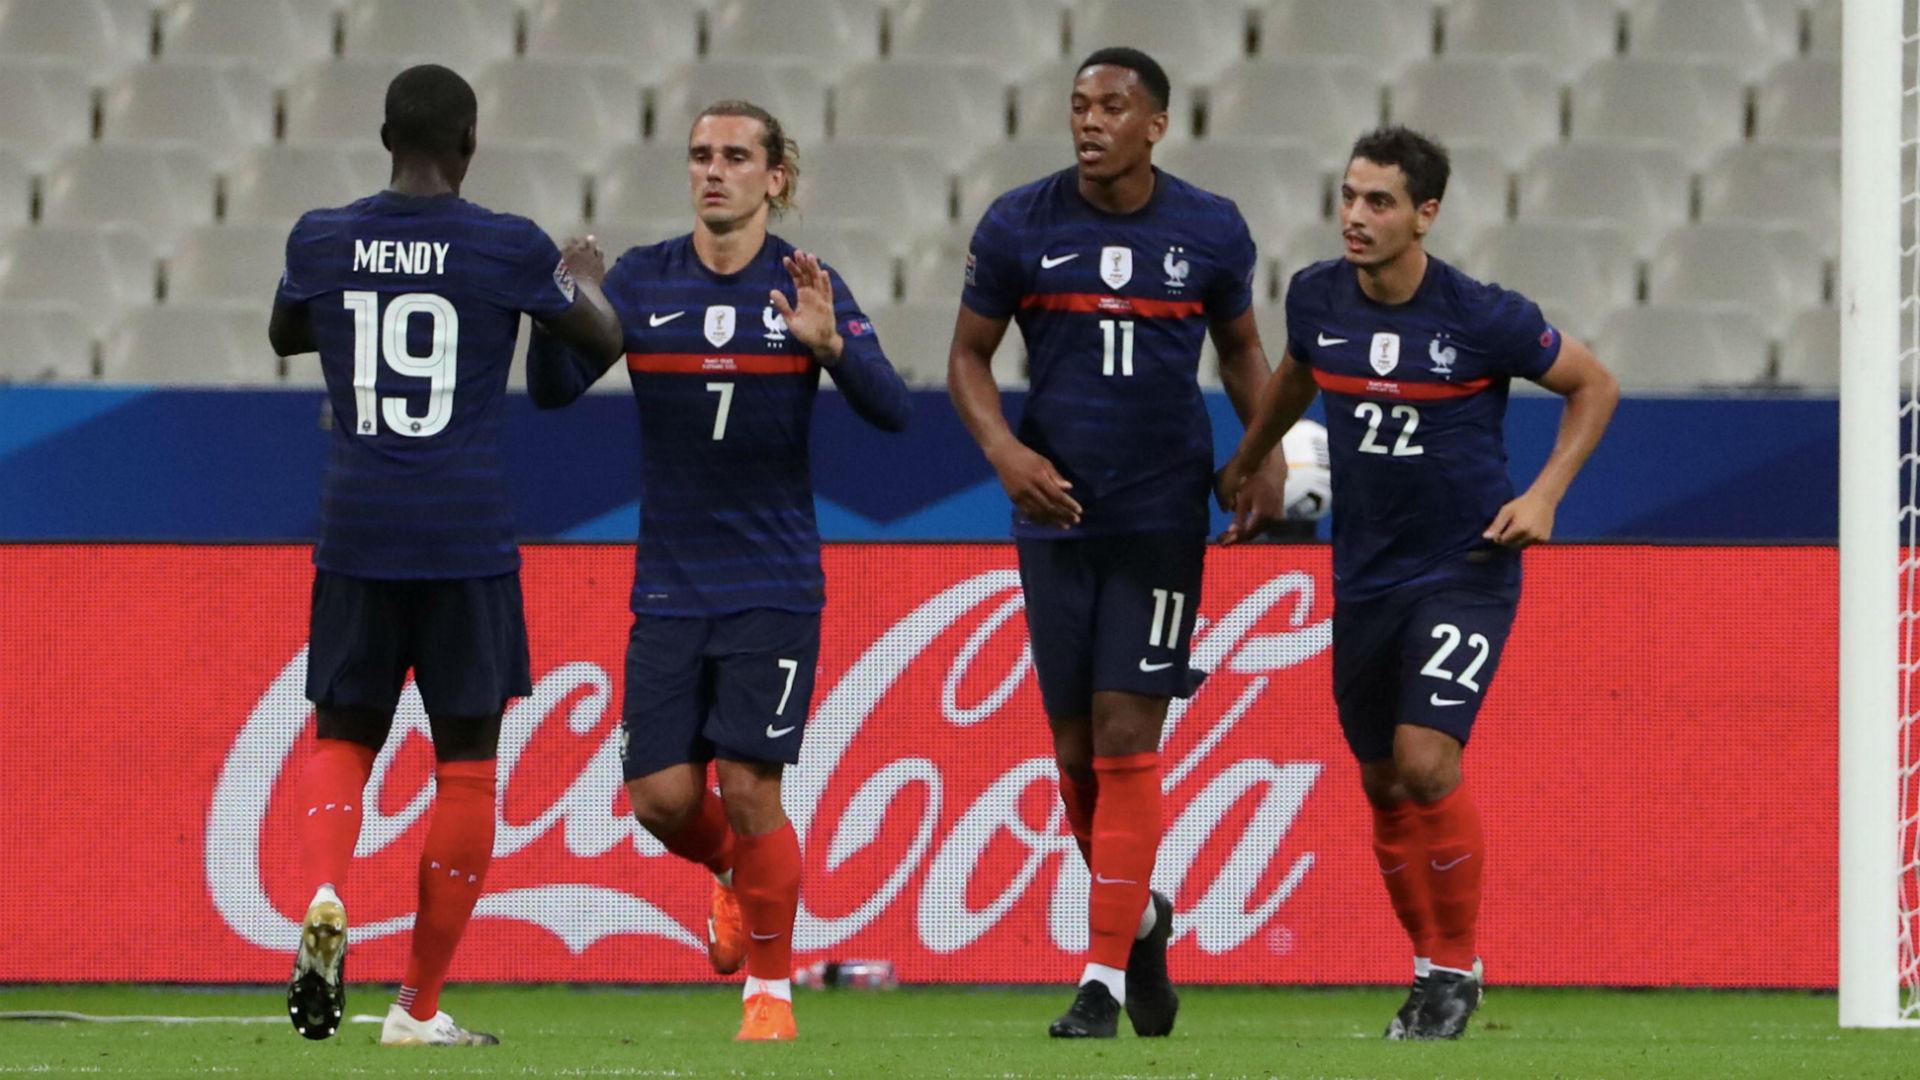 France 4-2 Croatia: Les Bleus win replay of 2018 World Cup final